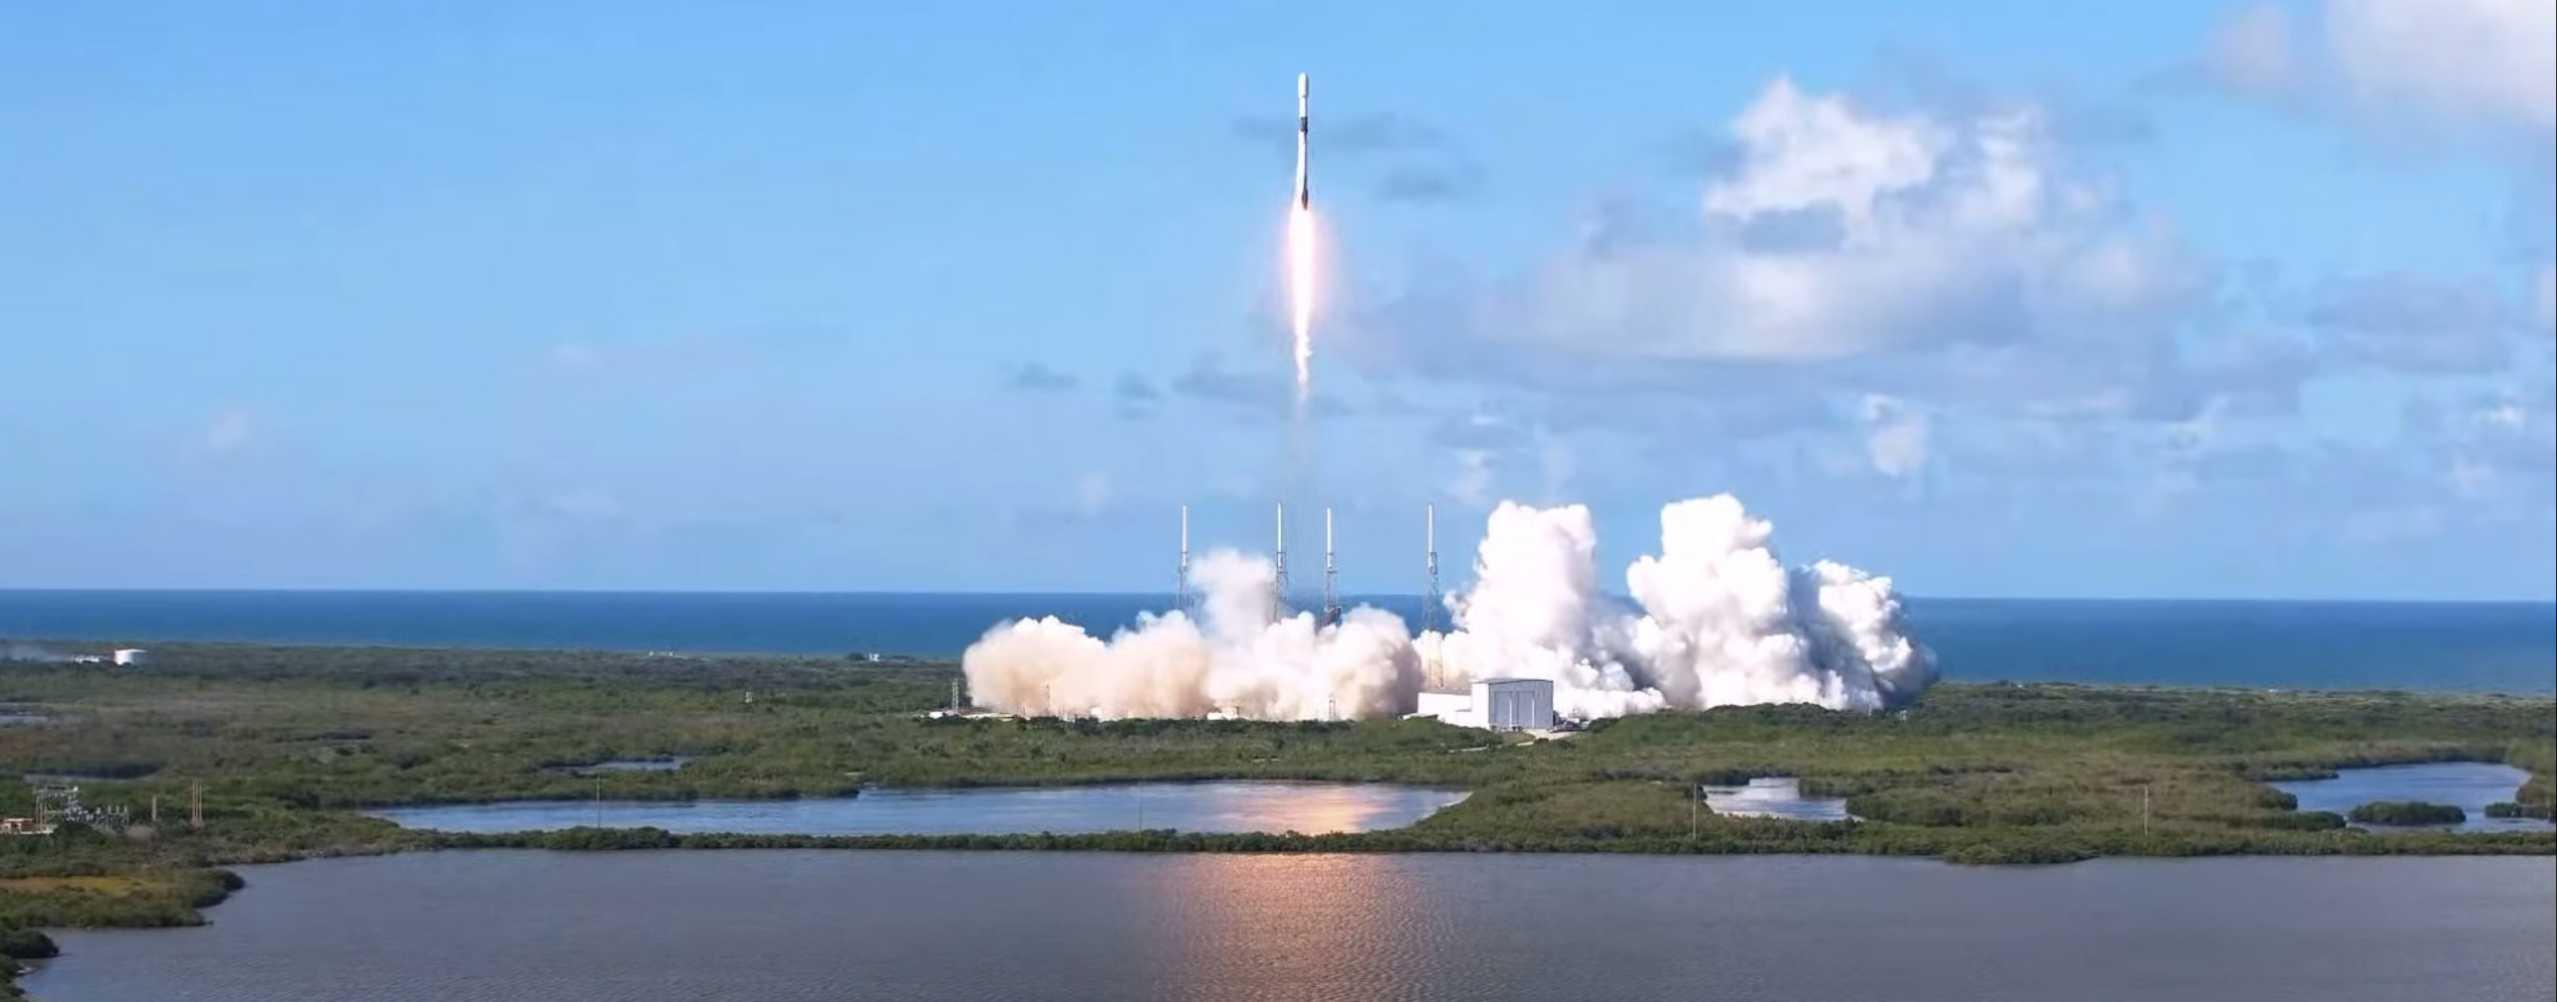 ANASIS II Falcon 9 B1058 LC-40 072020 (SpaceX) liftoff 2 (c)